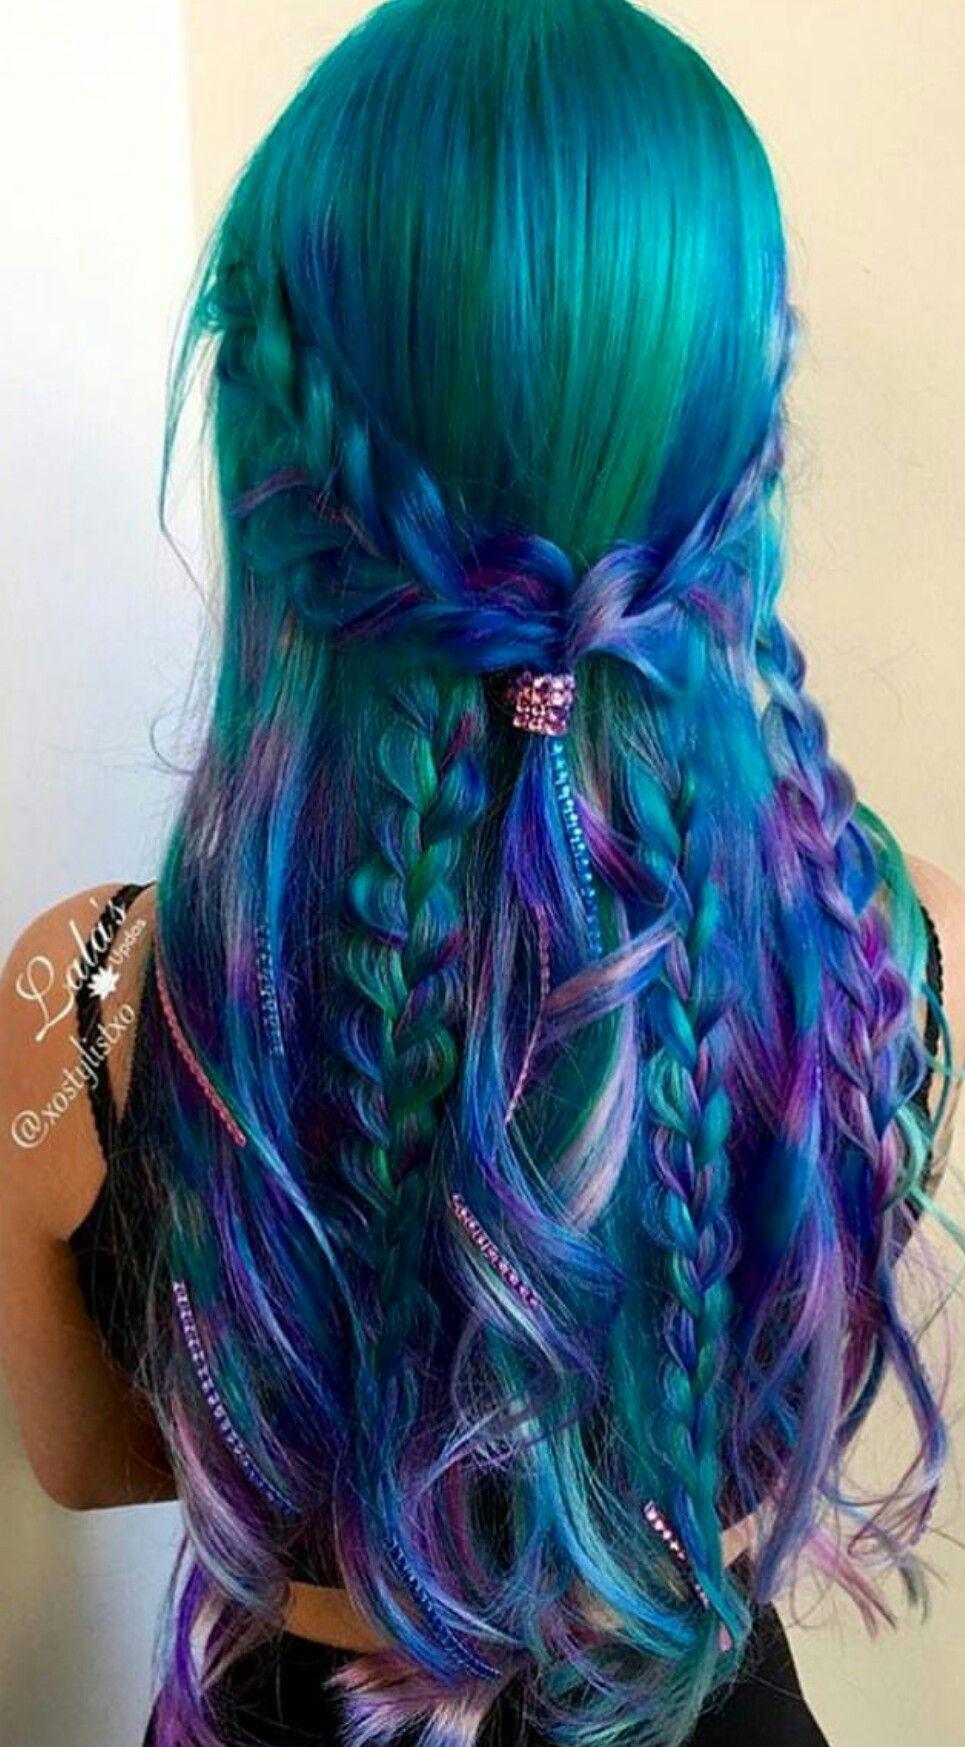 Green purple dyed hair color inspiration Hair Pinterest Dye